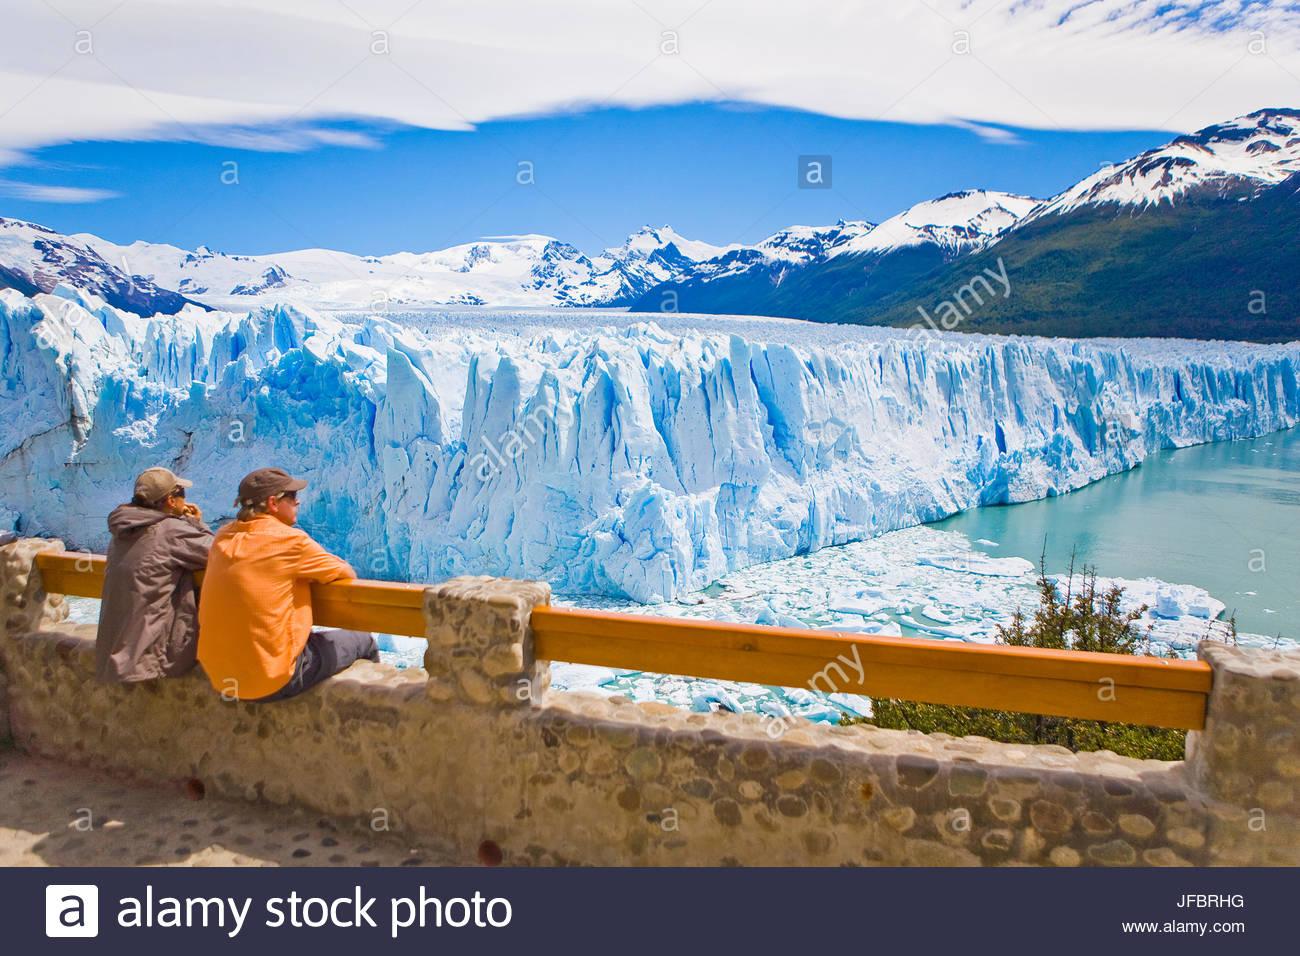 Les touristes en observant le glacier Perito Moreno en Argentine. Photo Stock